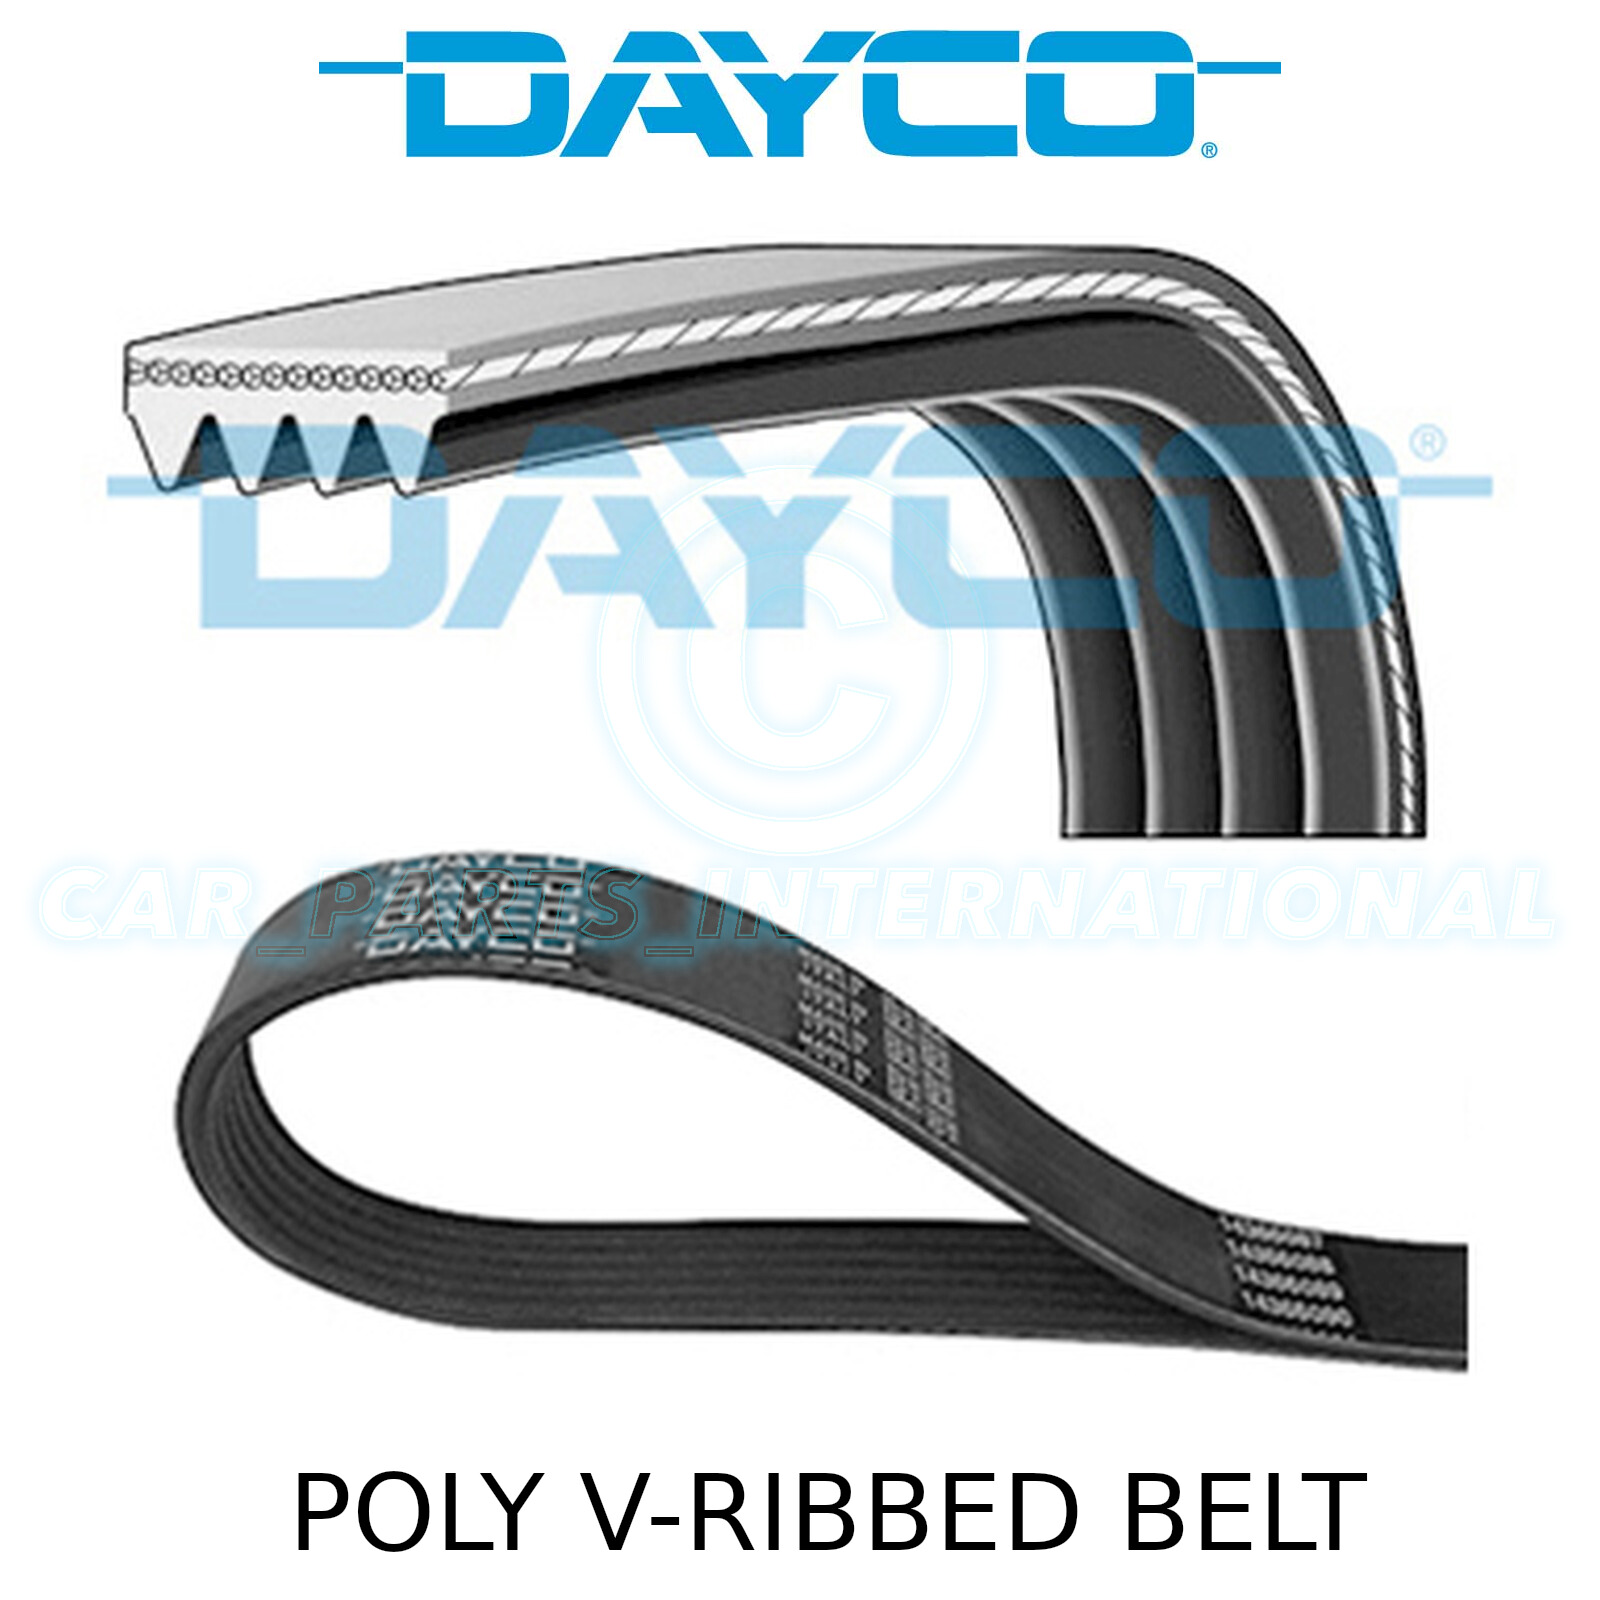 New Gates Micro V-Ribbed Belt 5 Ribs 1355mm Part No 5PK1355 OE Quality